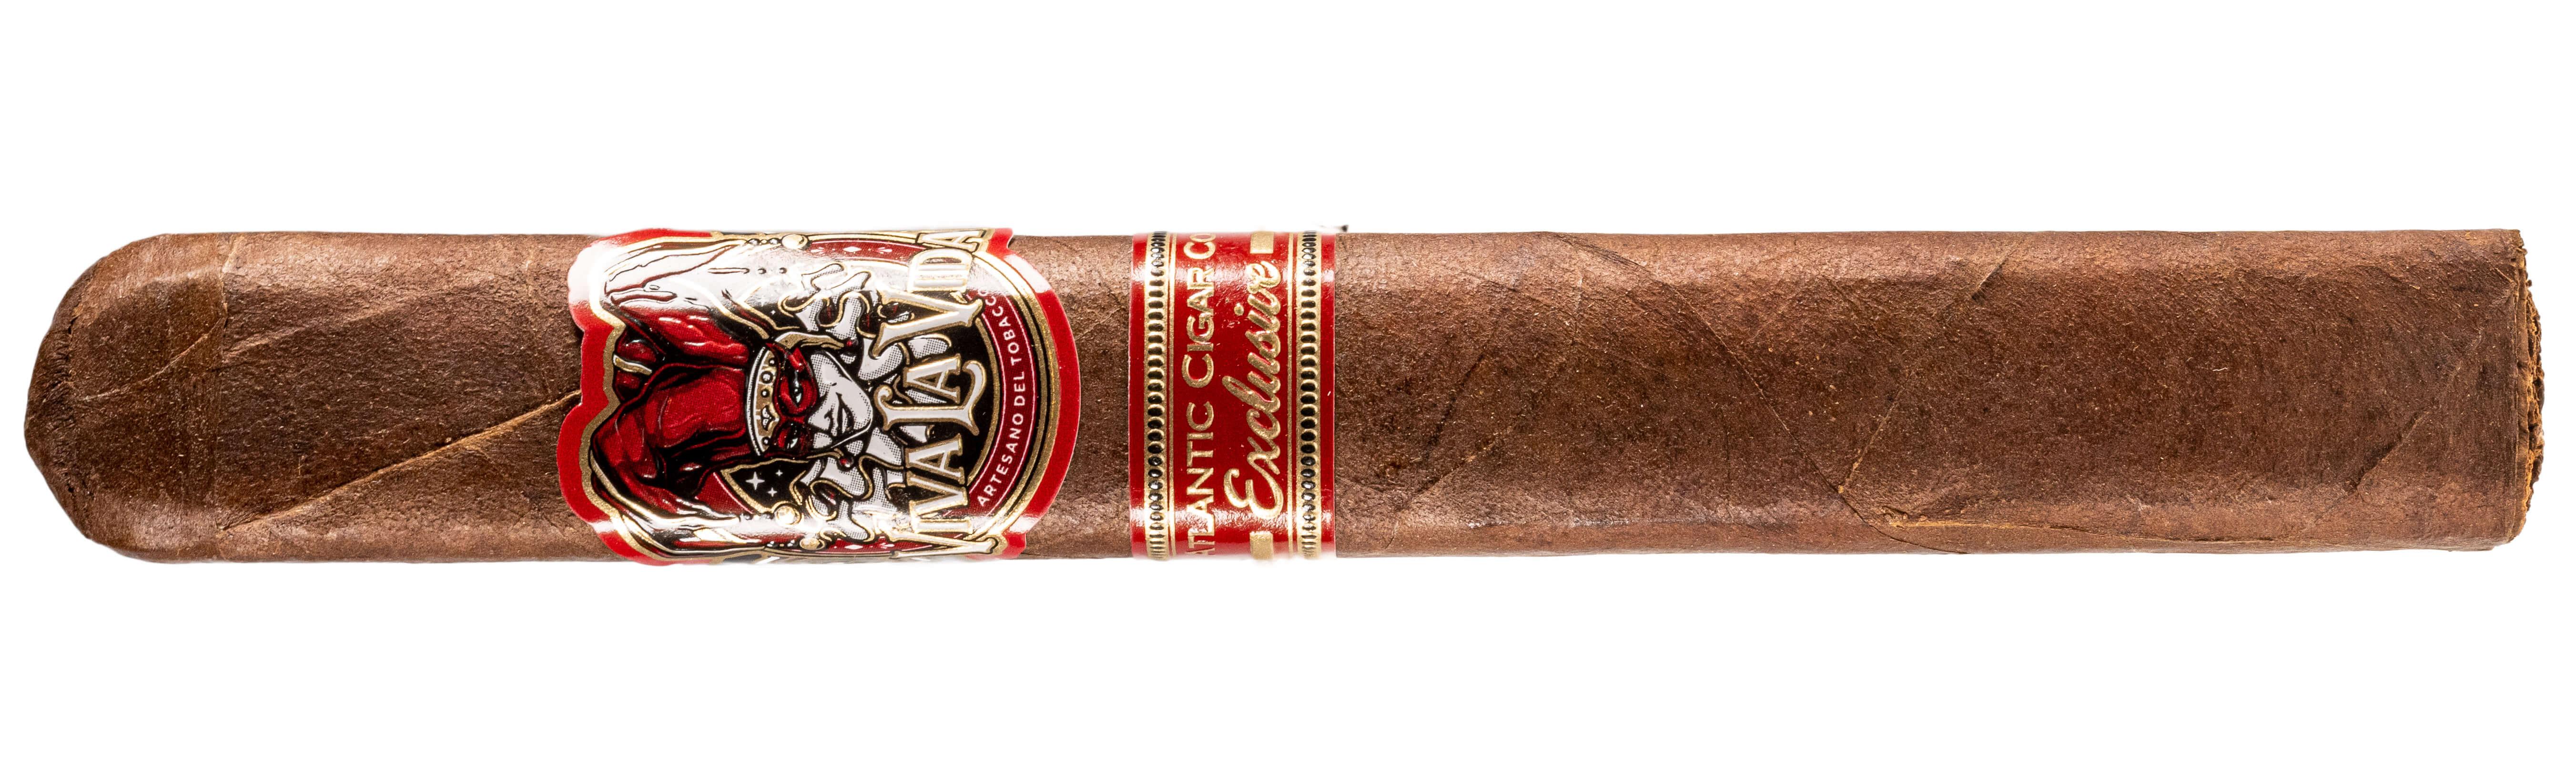 Blind Cigar Review: Viva La Vida | Atlantic Cigar Exclusive Box Pressed